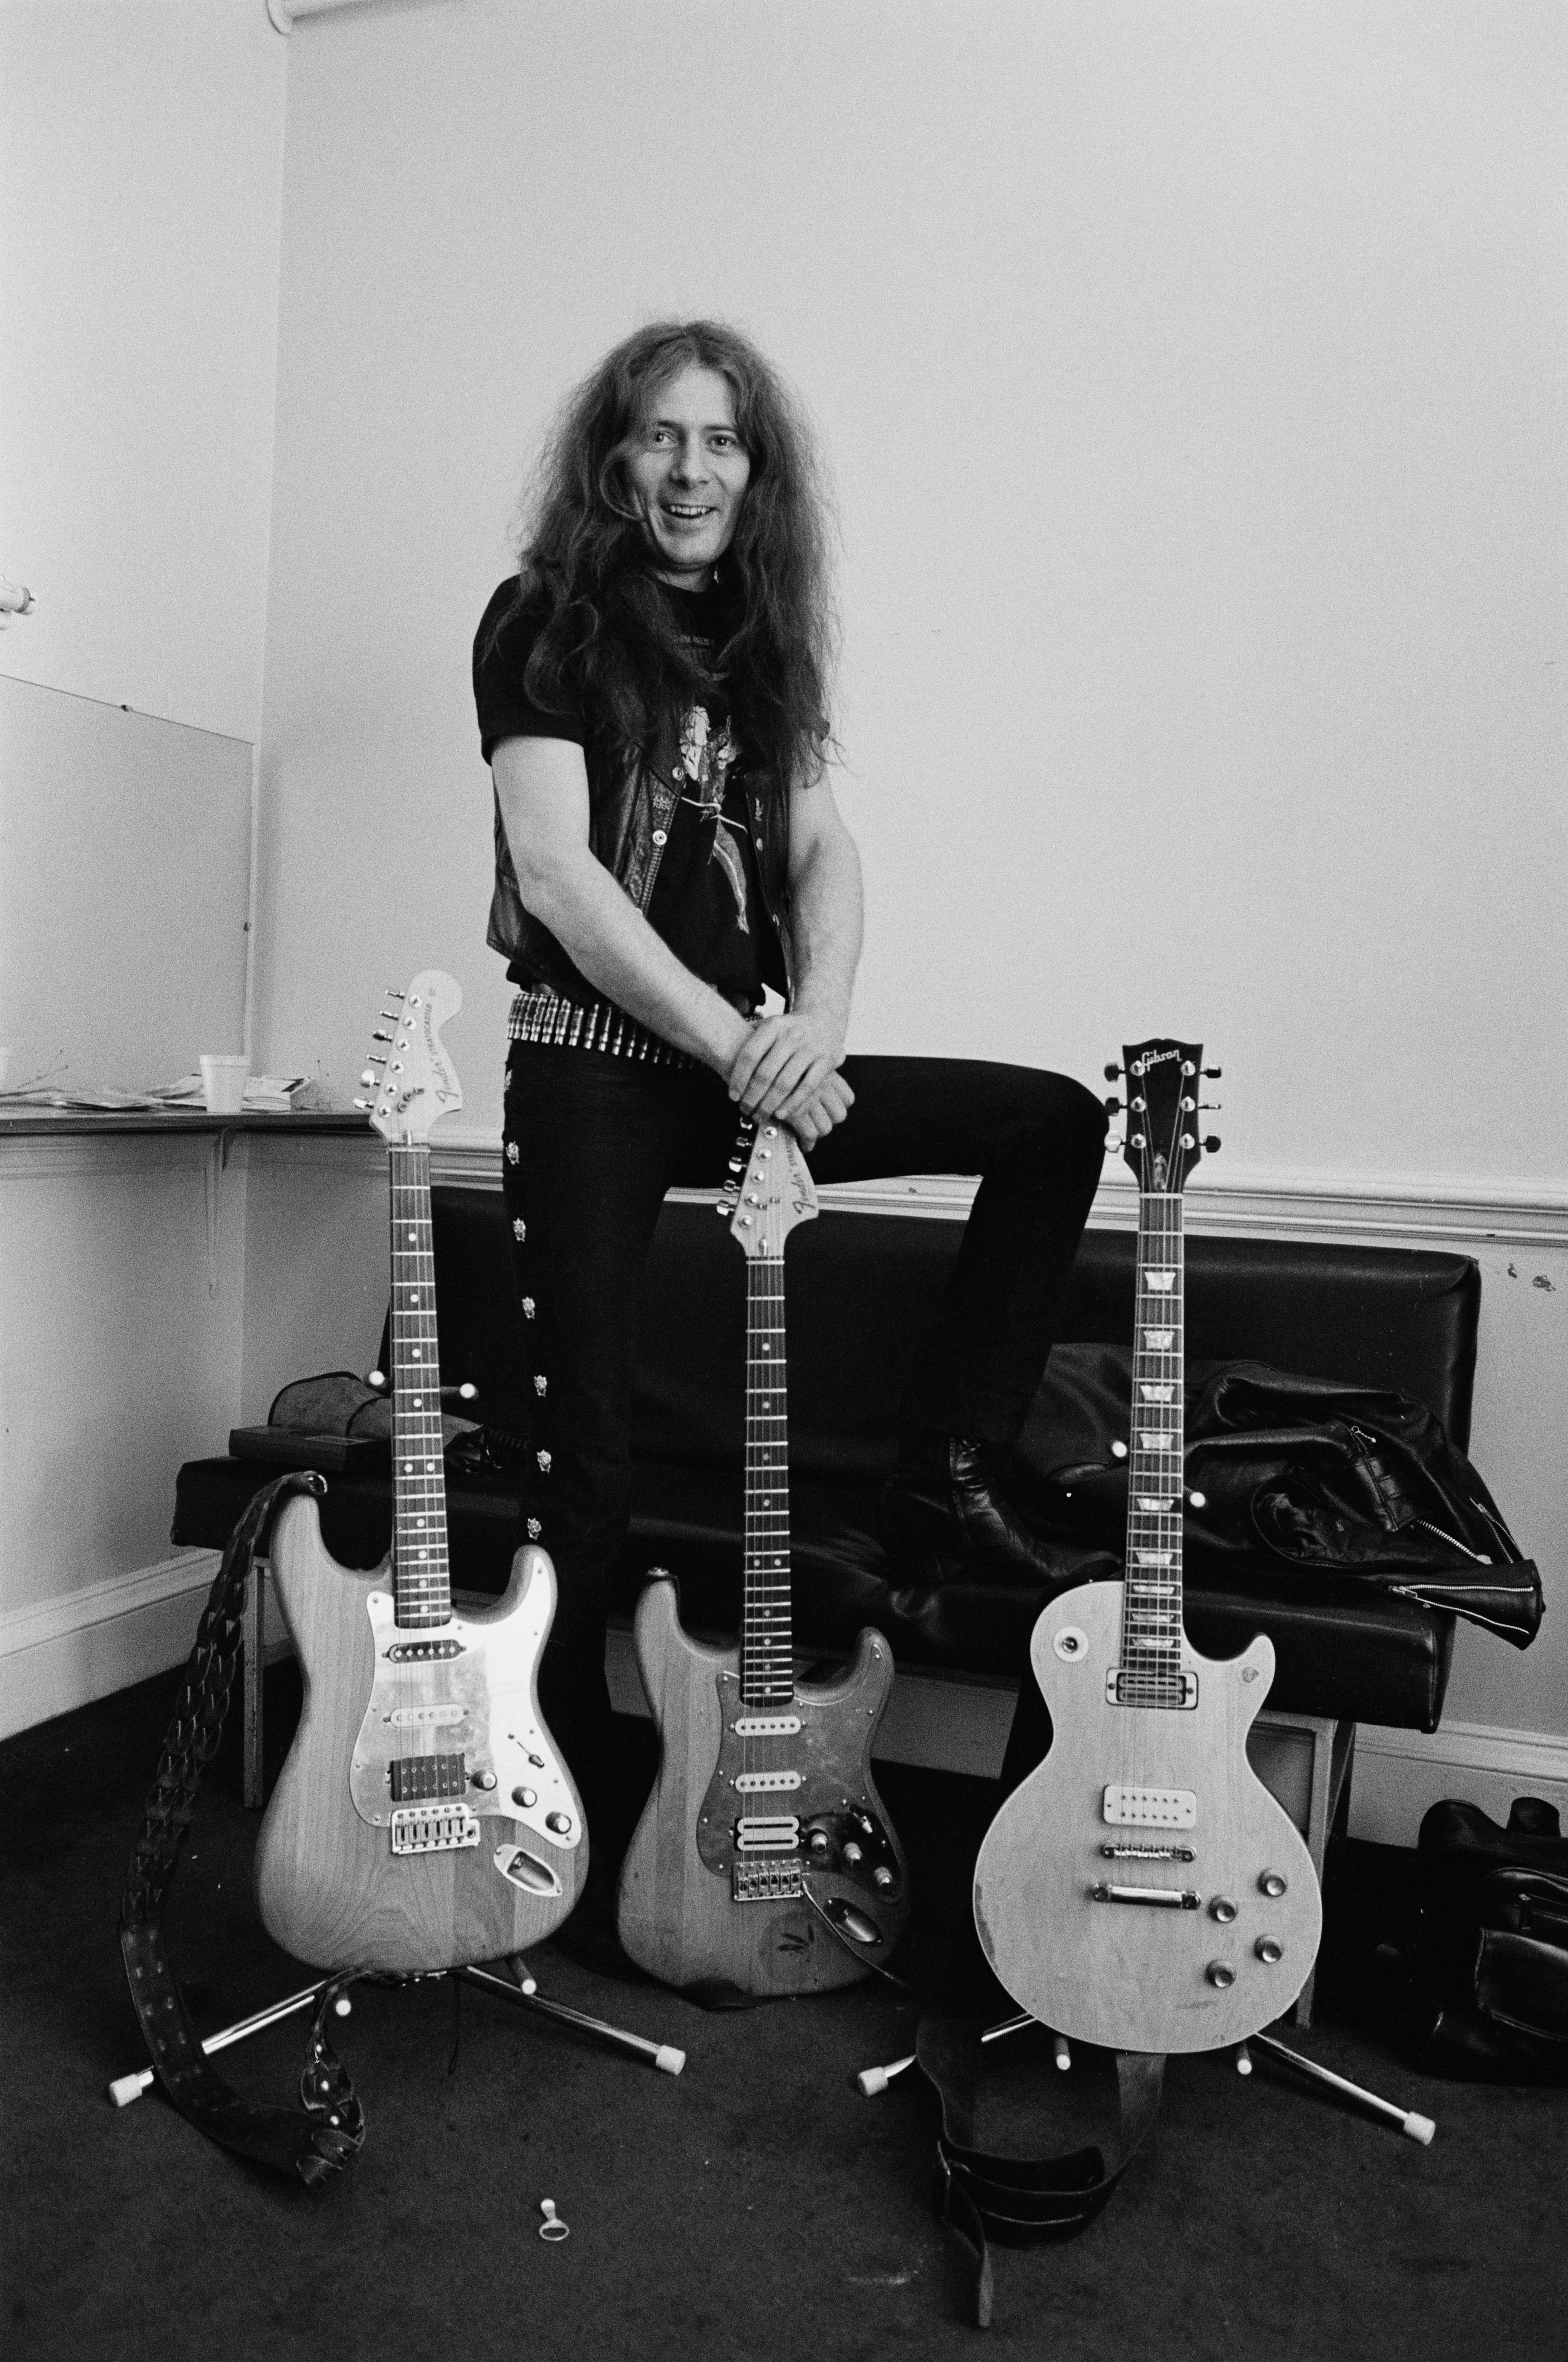 Former-Motorhead-Guitarist-Edward-Fast-Eddie-Clarke-Dead-At-67